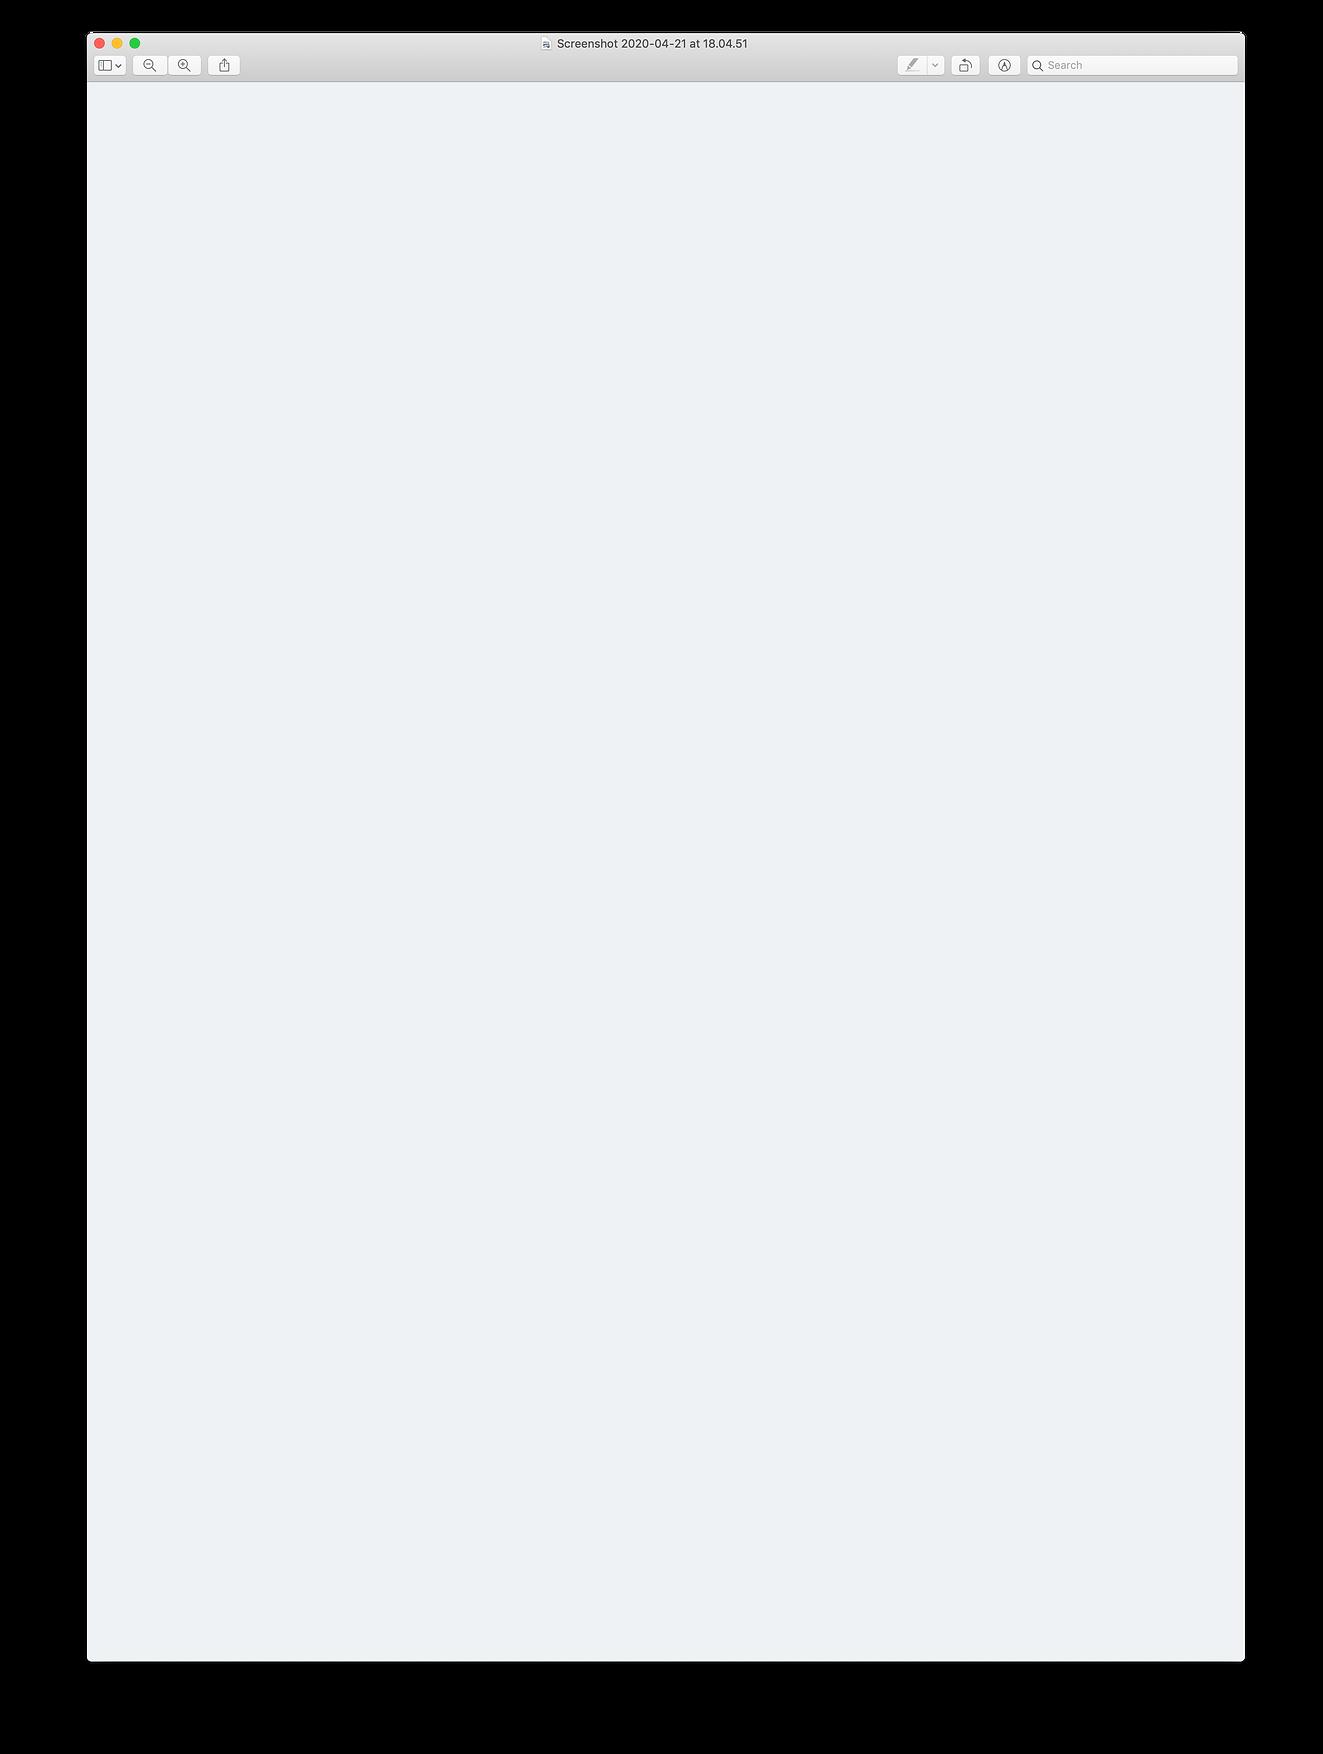 Screenshot 2020-04-21 at 18.05.38 copy.p